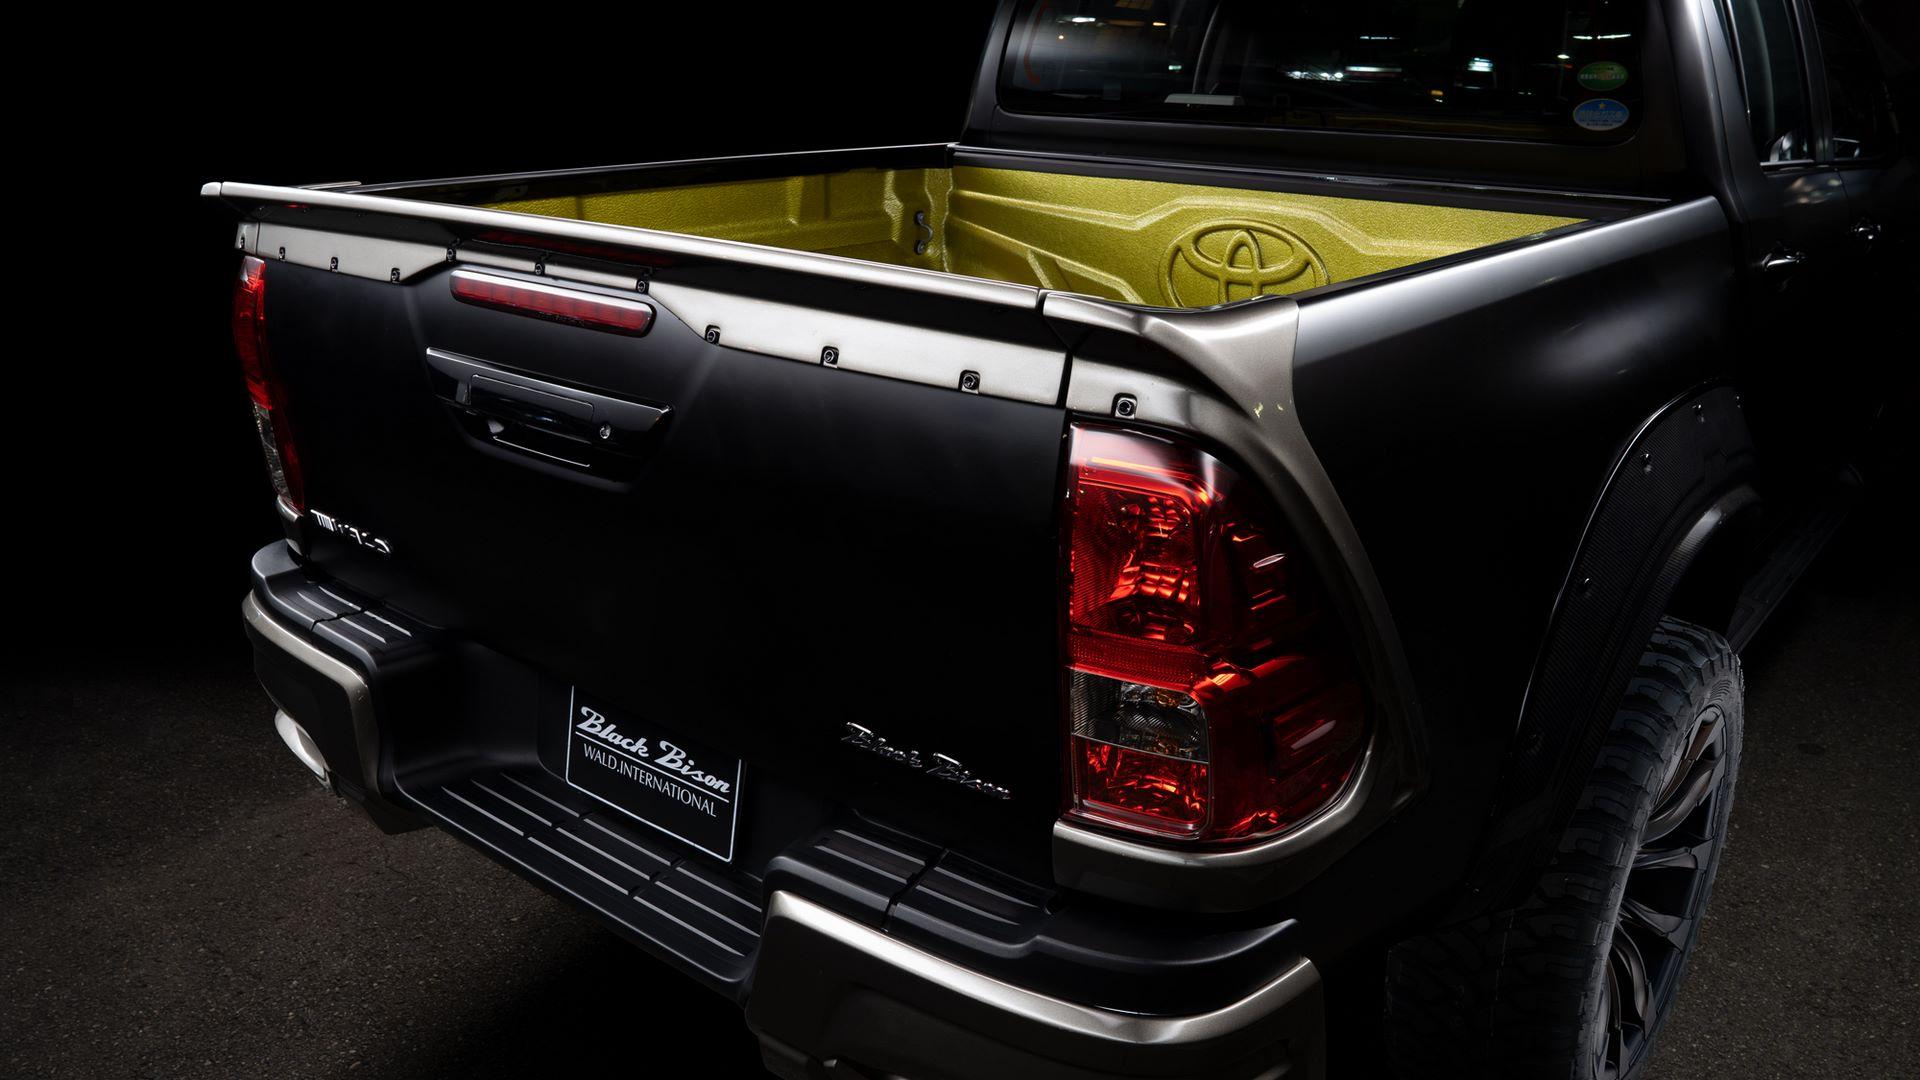 Toyota-Hilux-Black-Bison-by-Wald-International-8